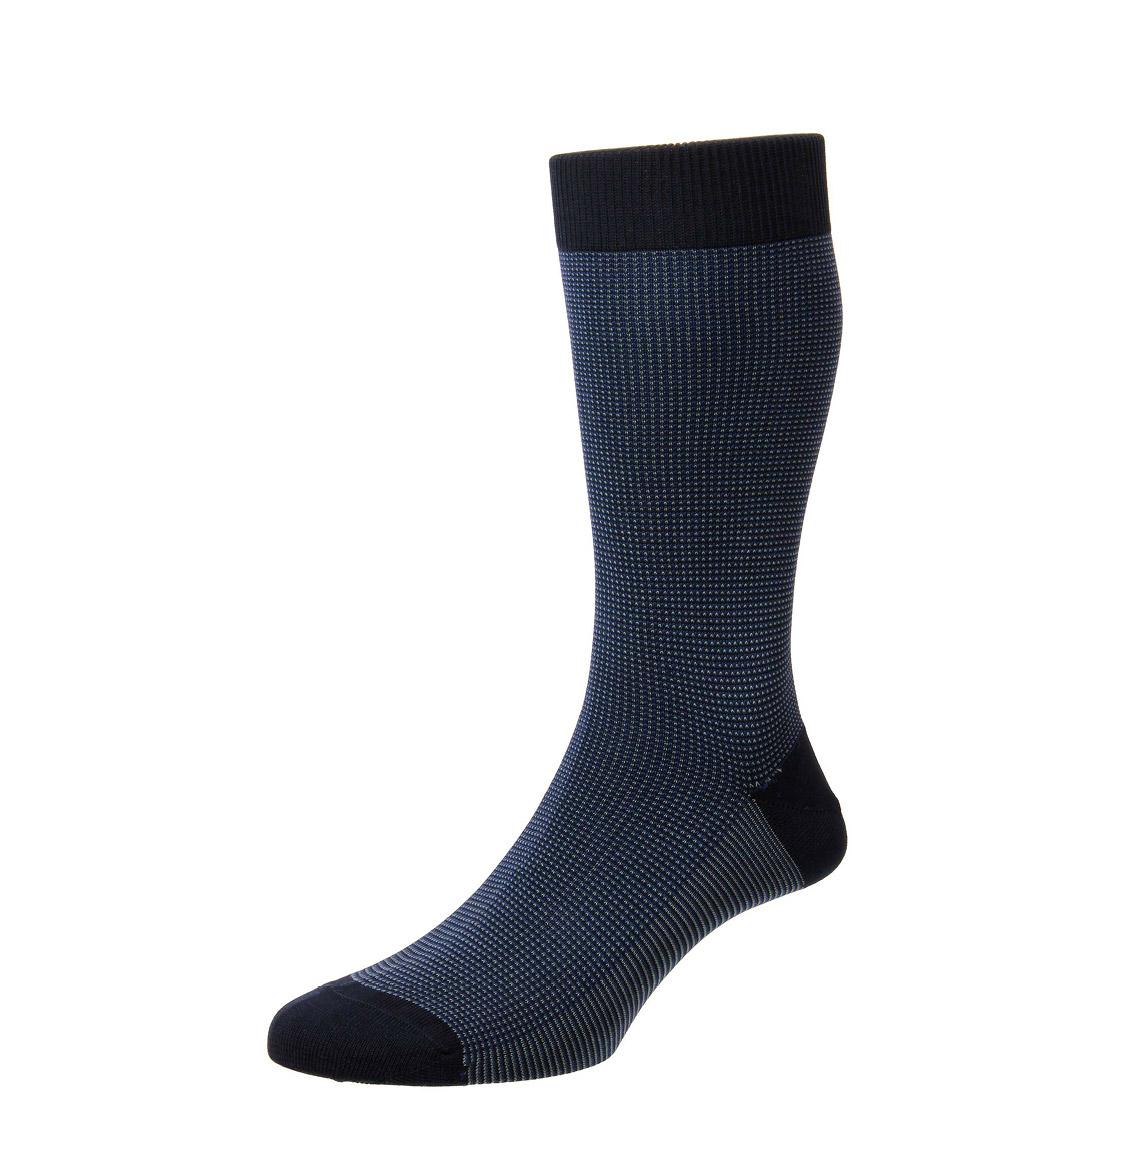 Pantherella Socks Tewkesbury Birdseye Navy